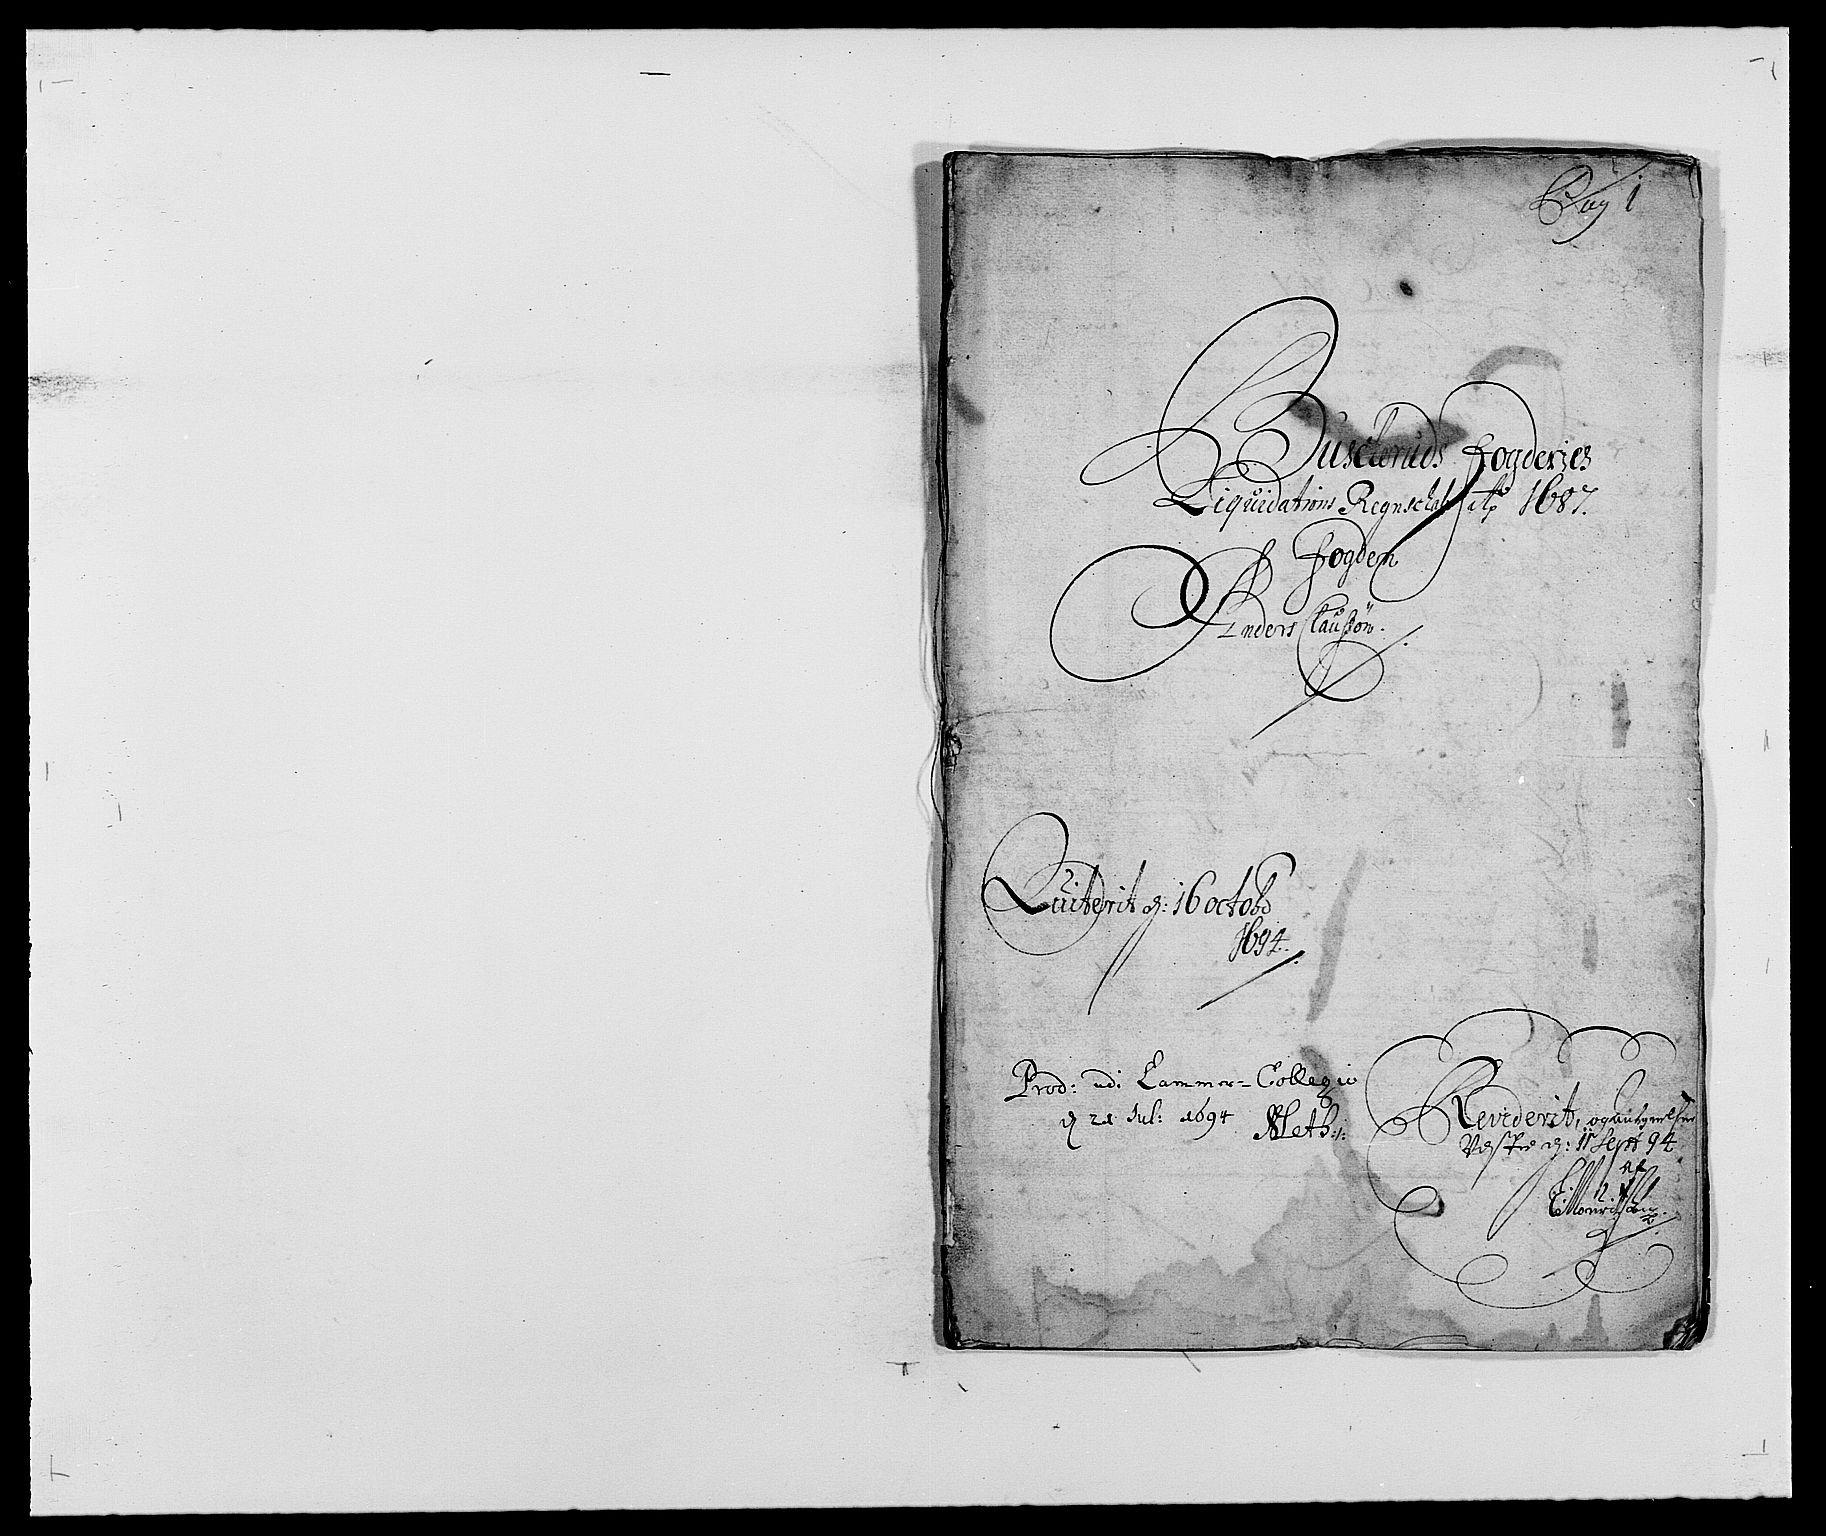 RA, Rentekammeret inntil 1814, Reviderte regnskaper, Fogderegnskap, R25/L1679: Fogderegnskap Buskerud, 1687-1688, s. 2